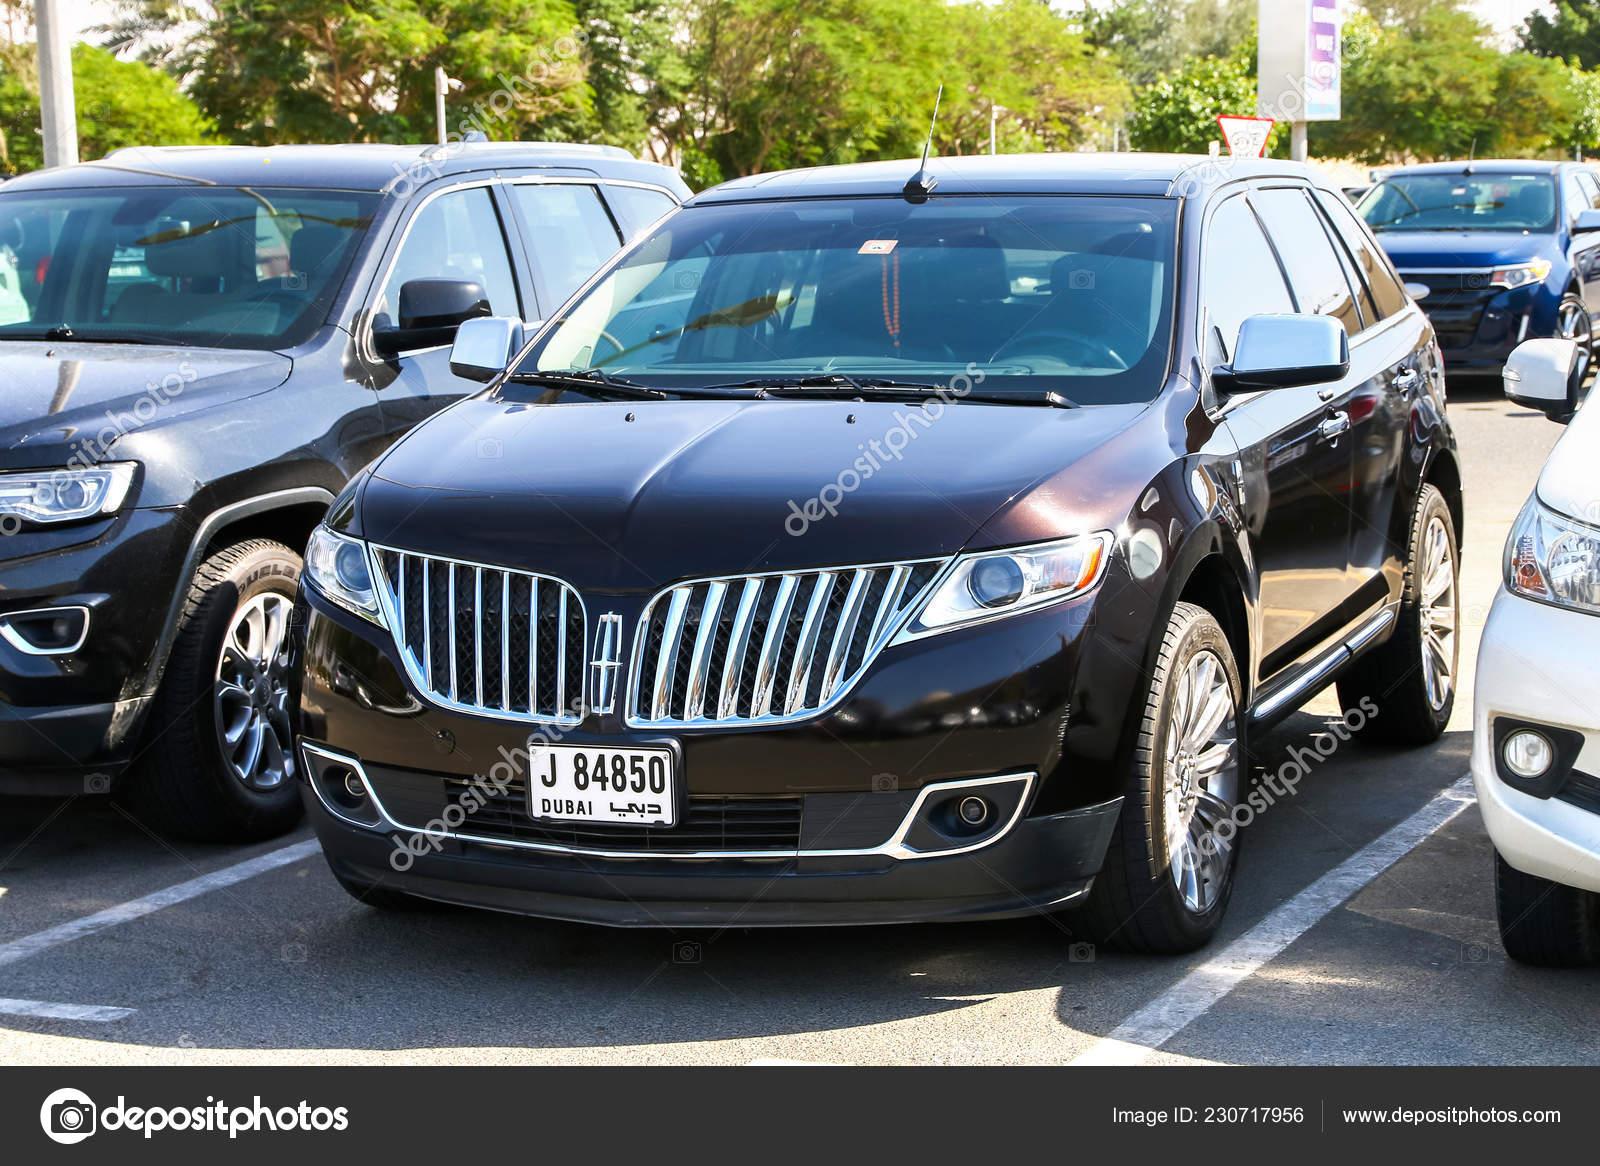 Dubai Uae November 2018 Motor Car Lincoln Mkx City Street Stock